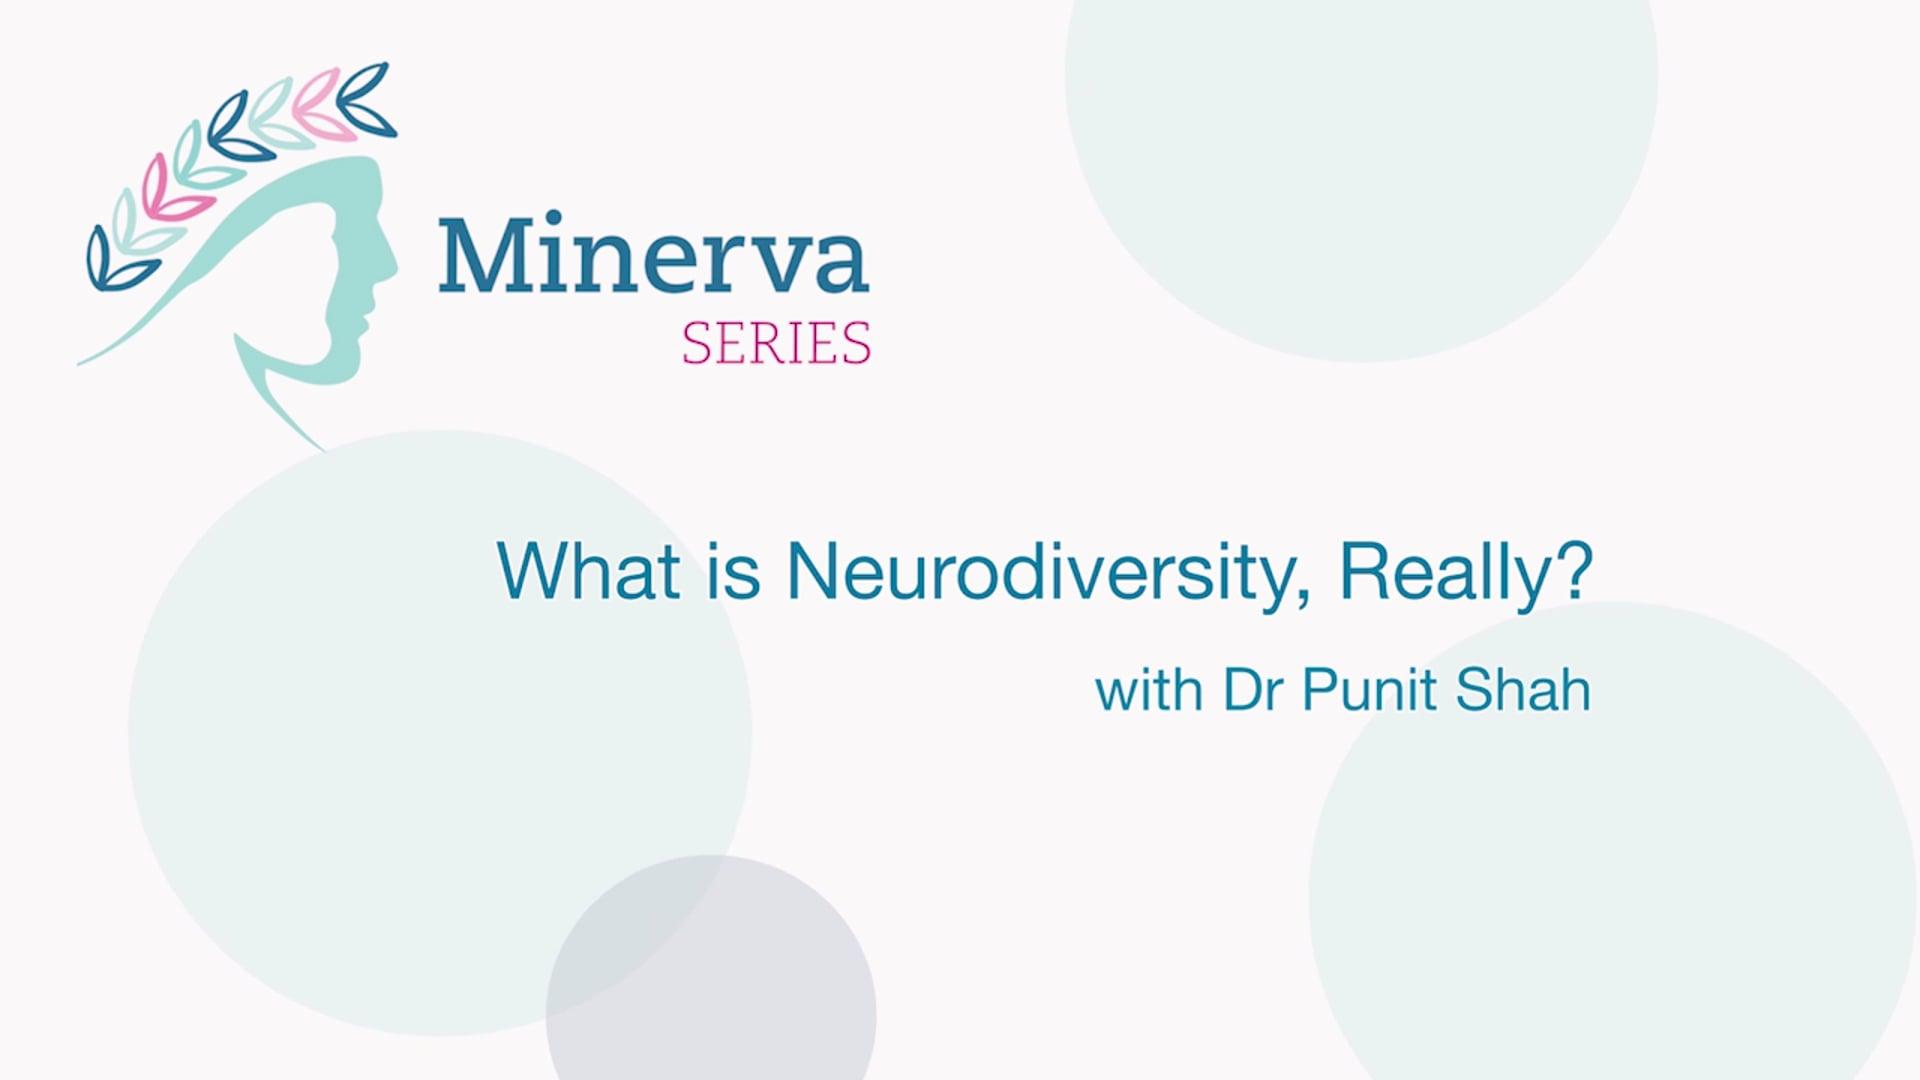 Minerva - What is Neurodiversity, Really?